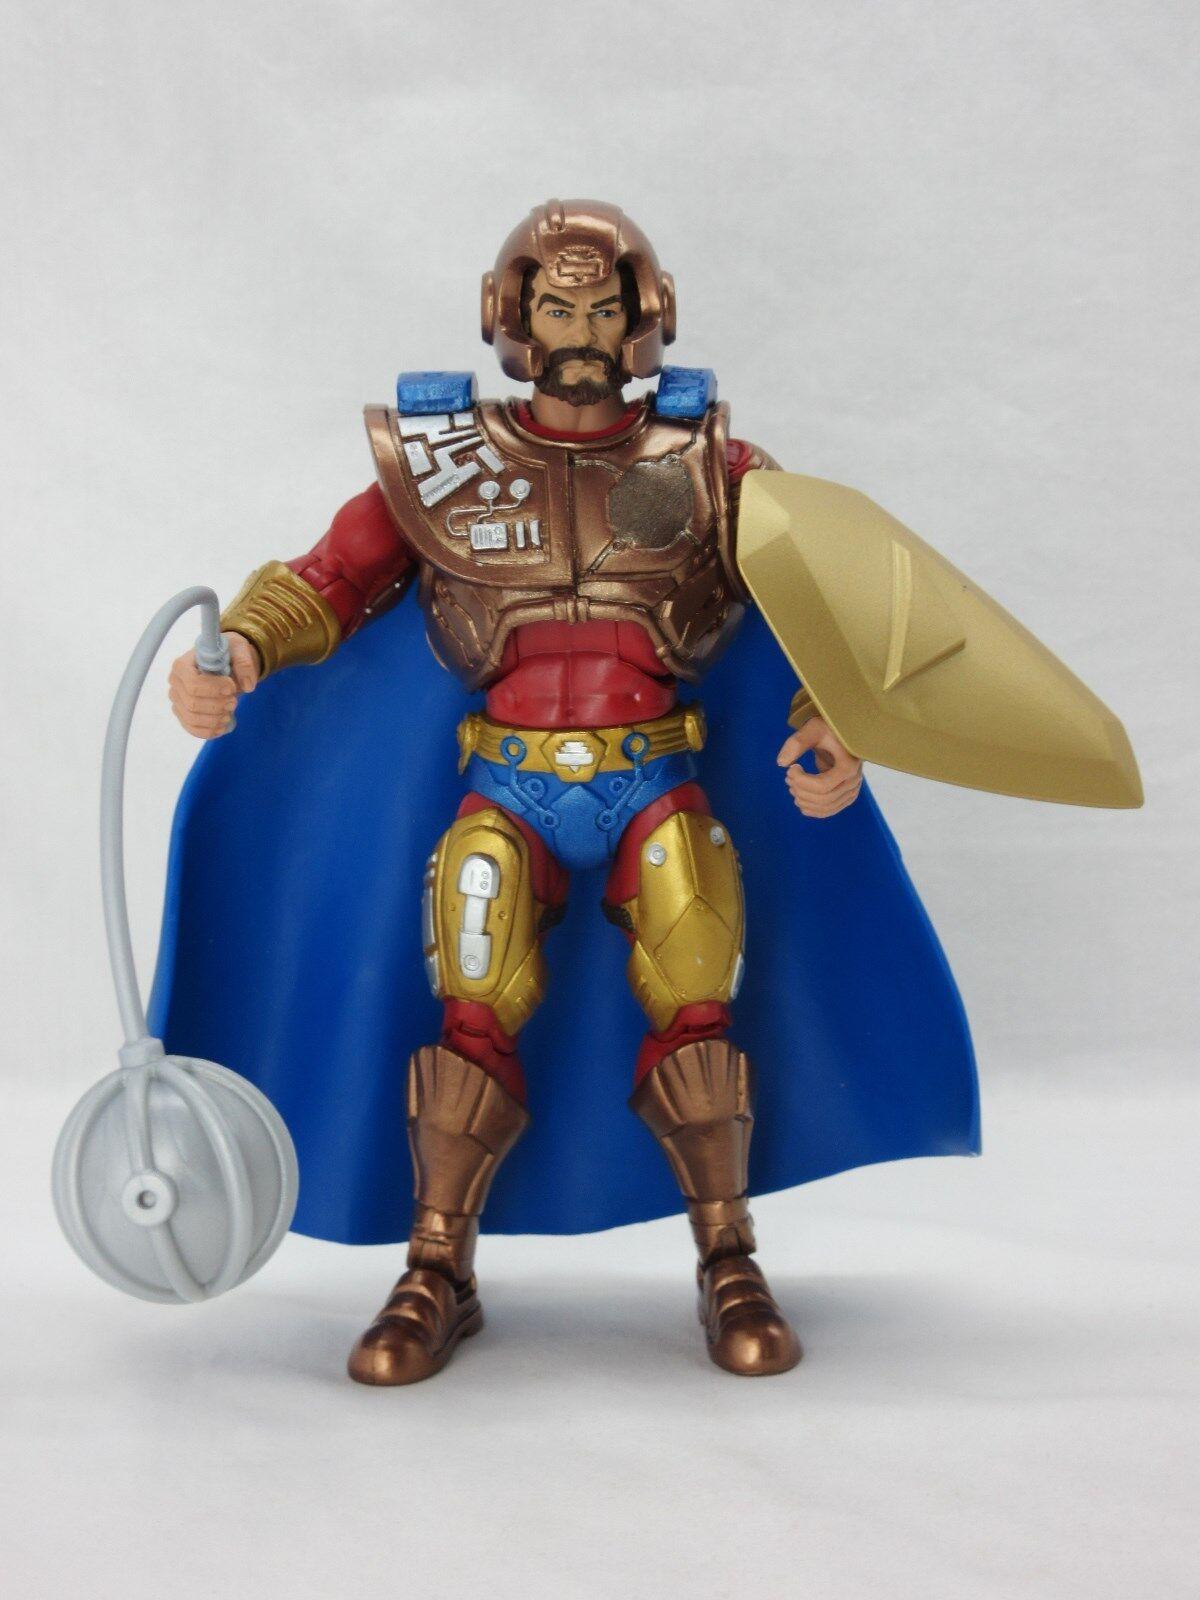 MOTUC,MOTU,DARIUS,Masters Of The The The Universe Classics,100% Complete,He-Man 36181c